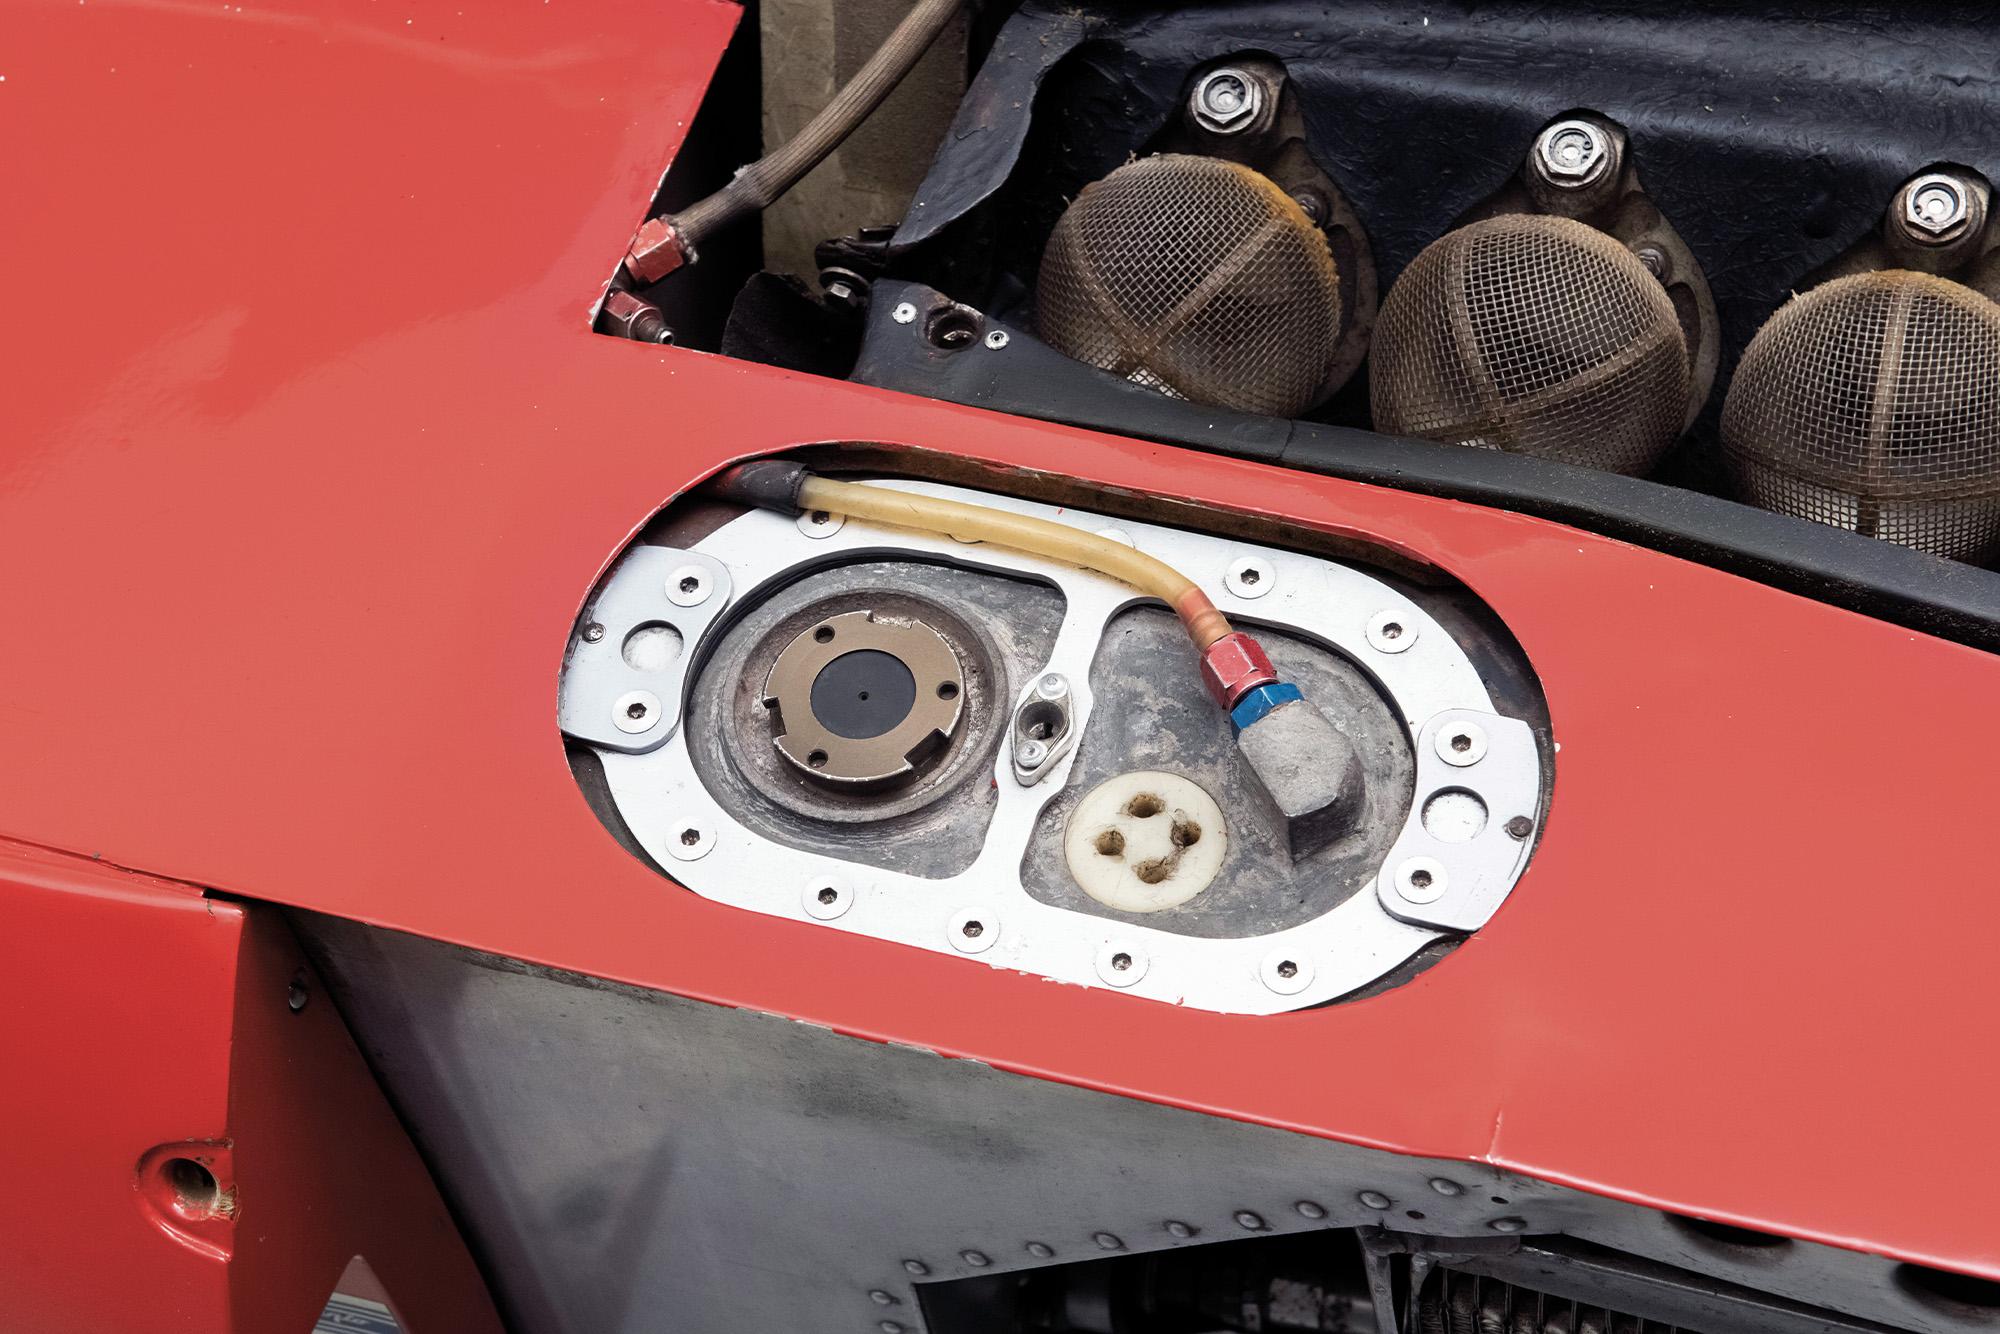 Detail shot of the 1975 Ferrari 312T